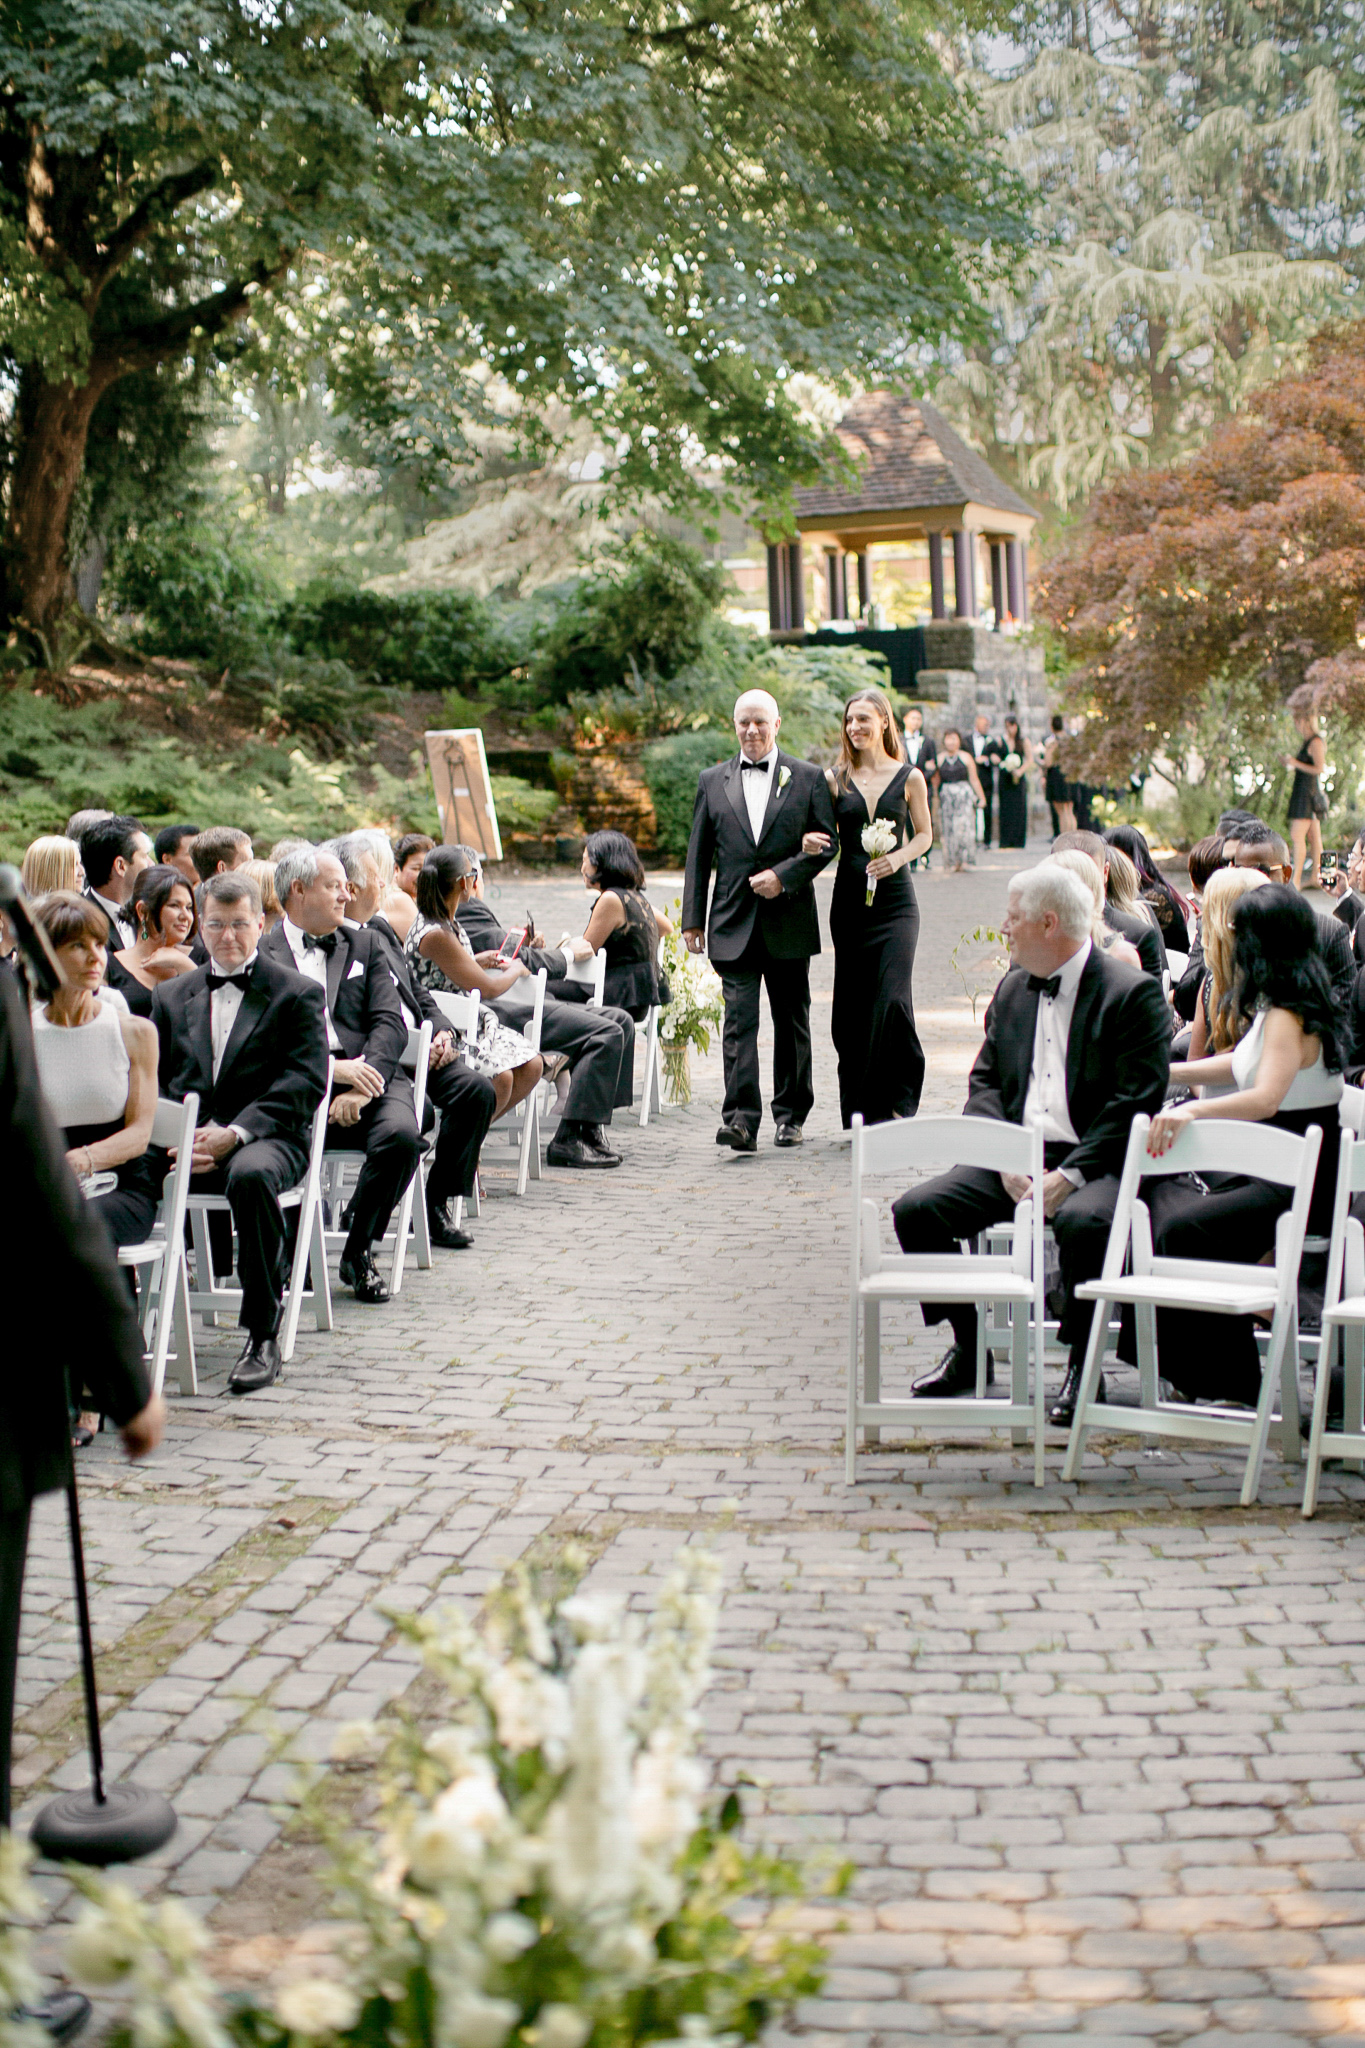 123OutliveCreative_Travel_Photographer_Videographer_Lewis&Clark_Oregon_Elegant_BlackTie_Destination_Wedding.jpg